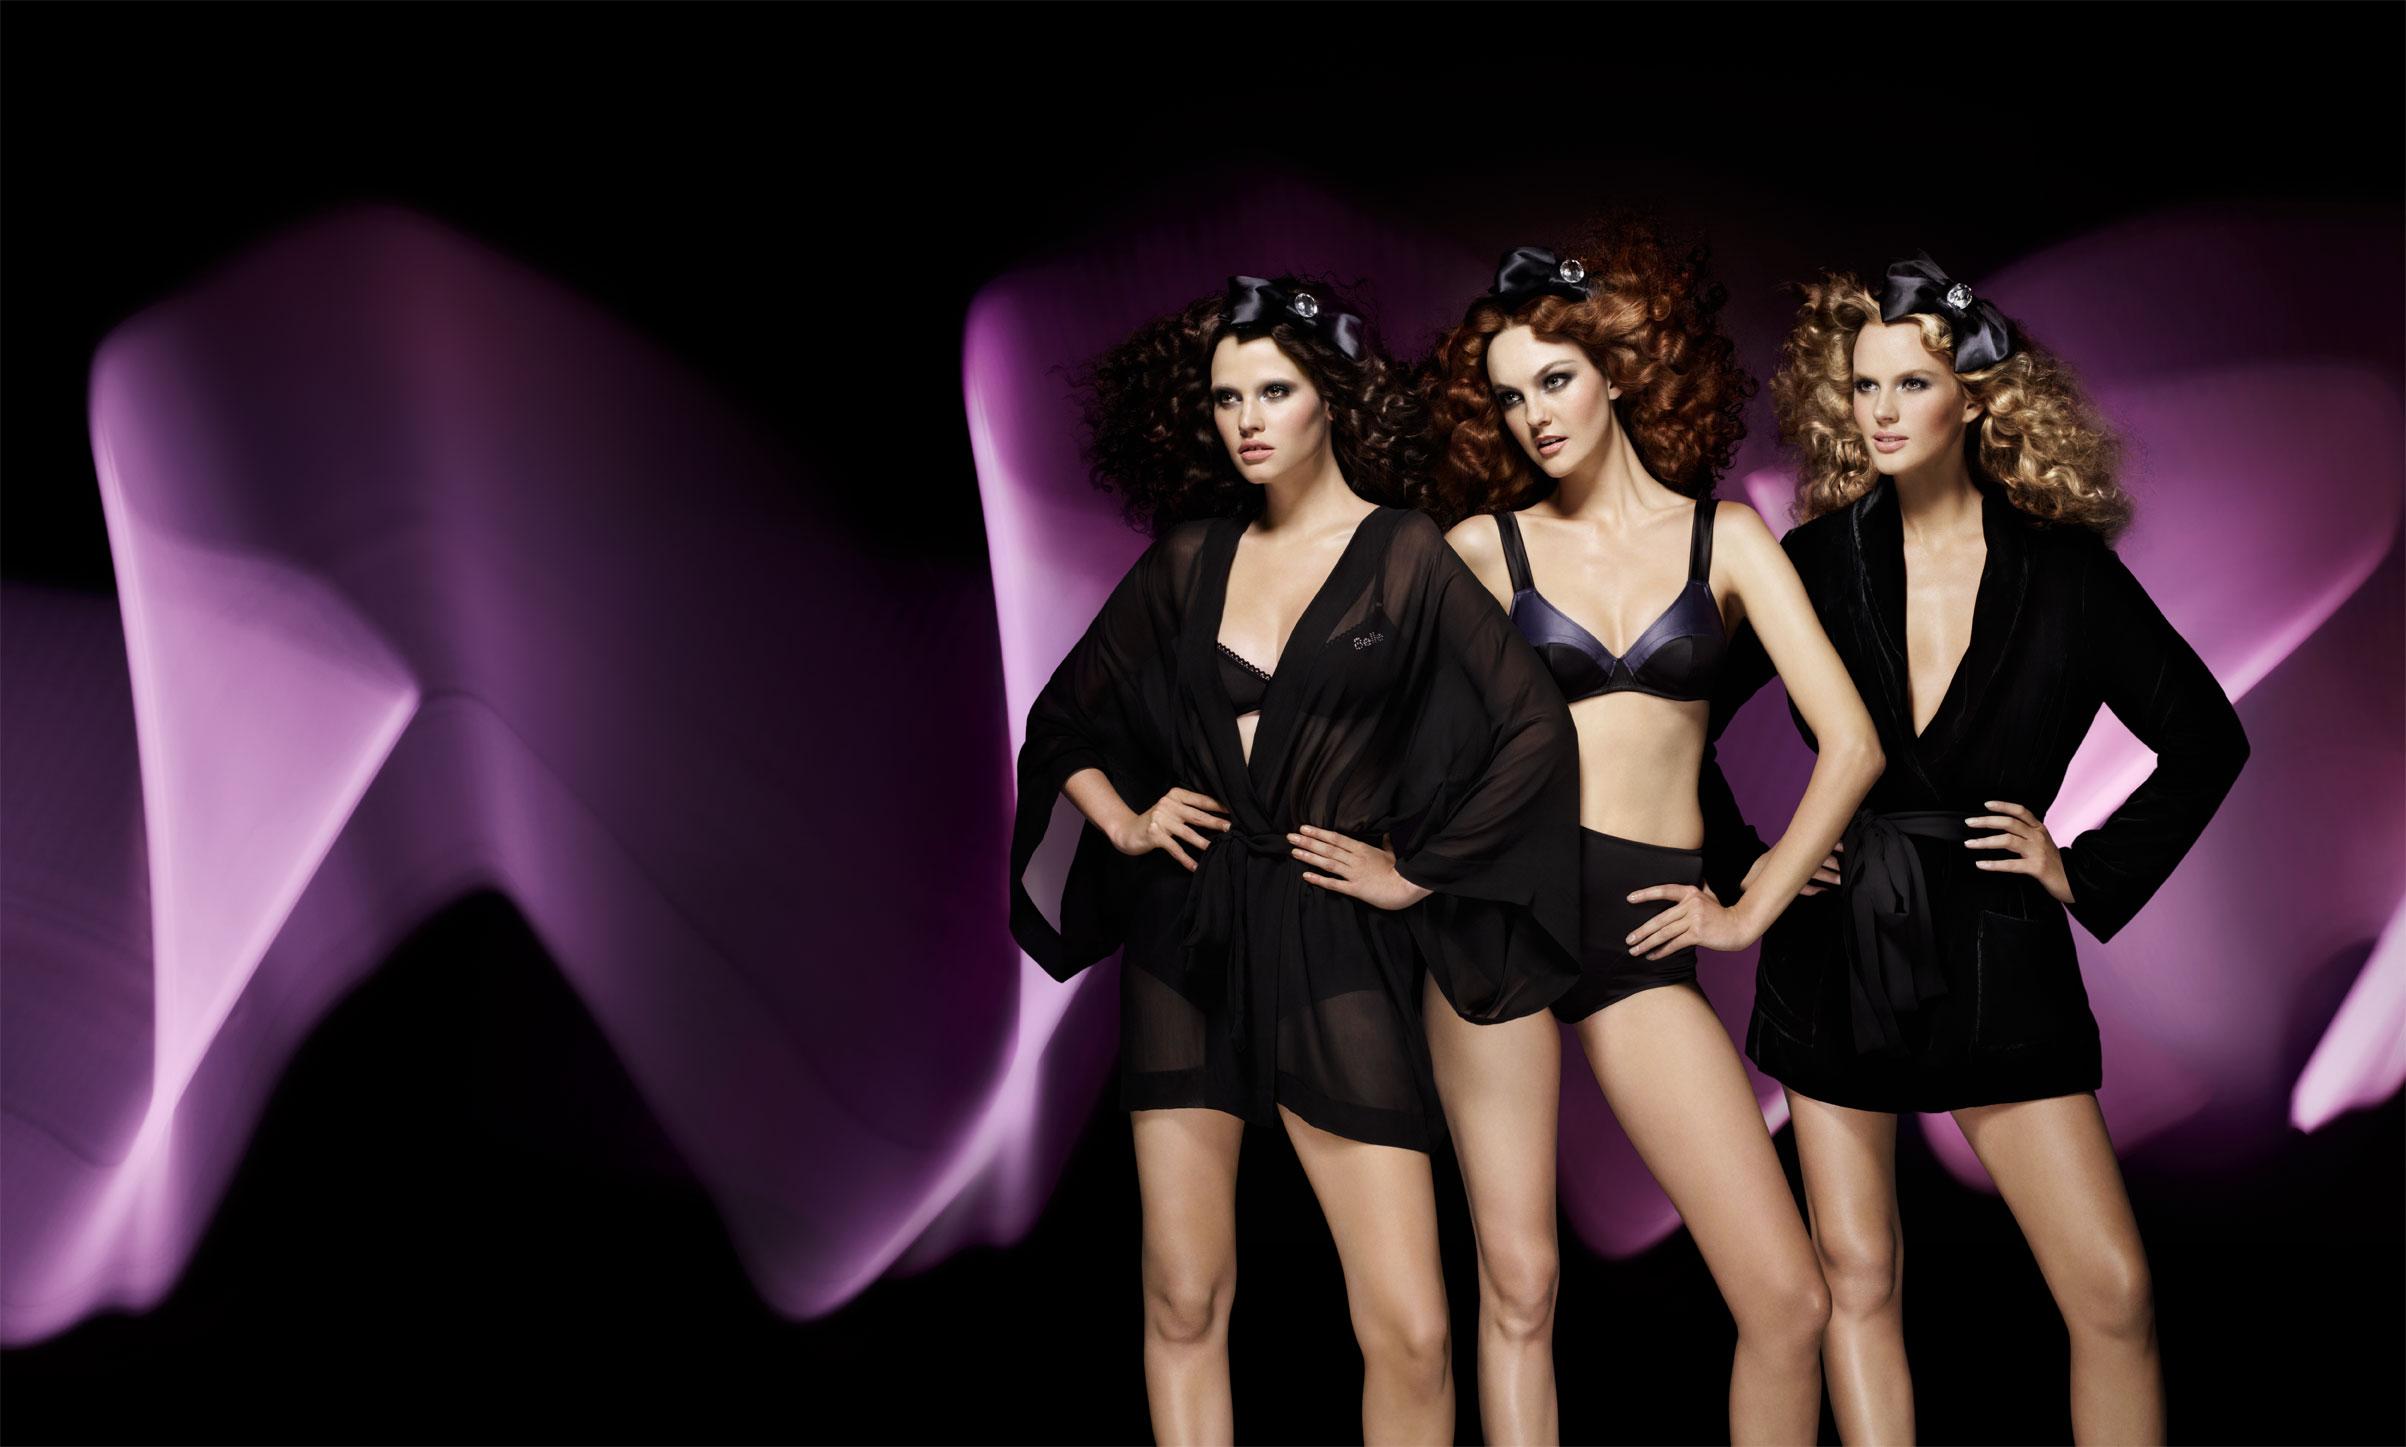 DISE3602 / Medio B » Blog Archive » Sonia Rykiel Pour H&M